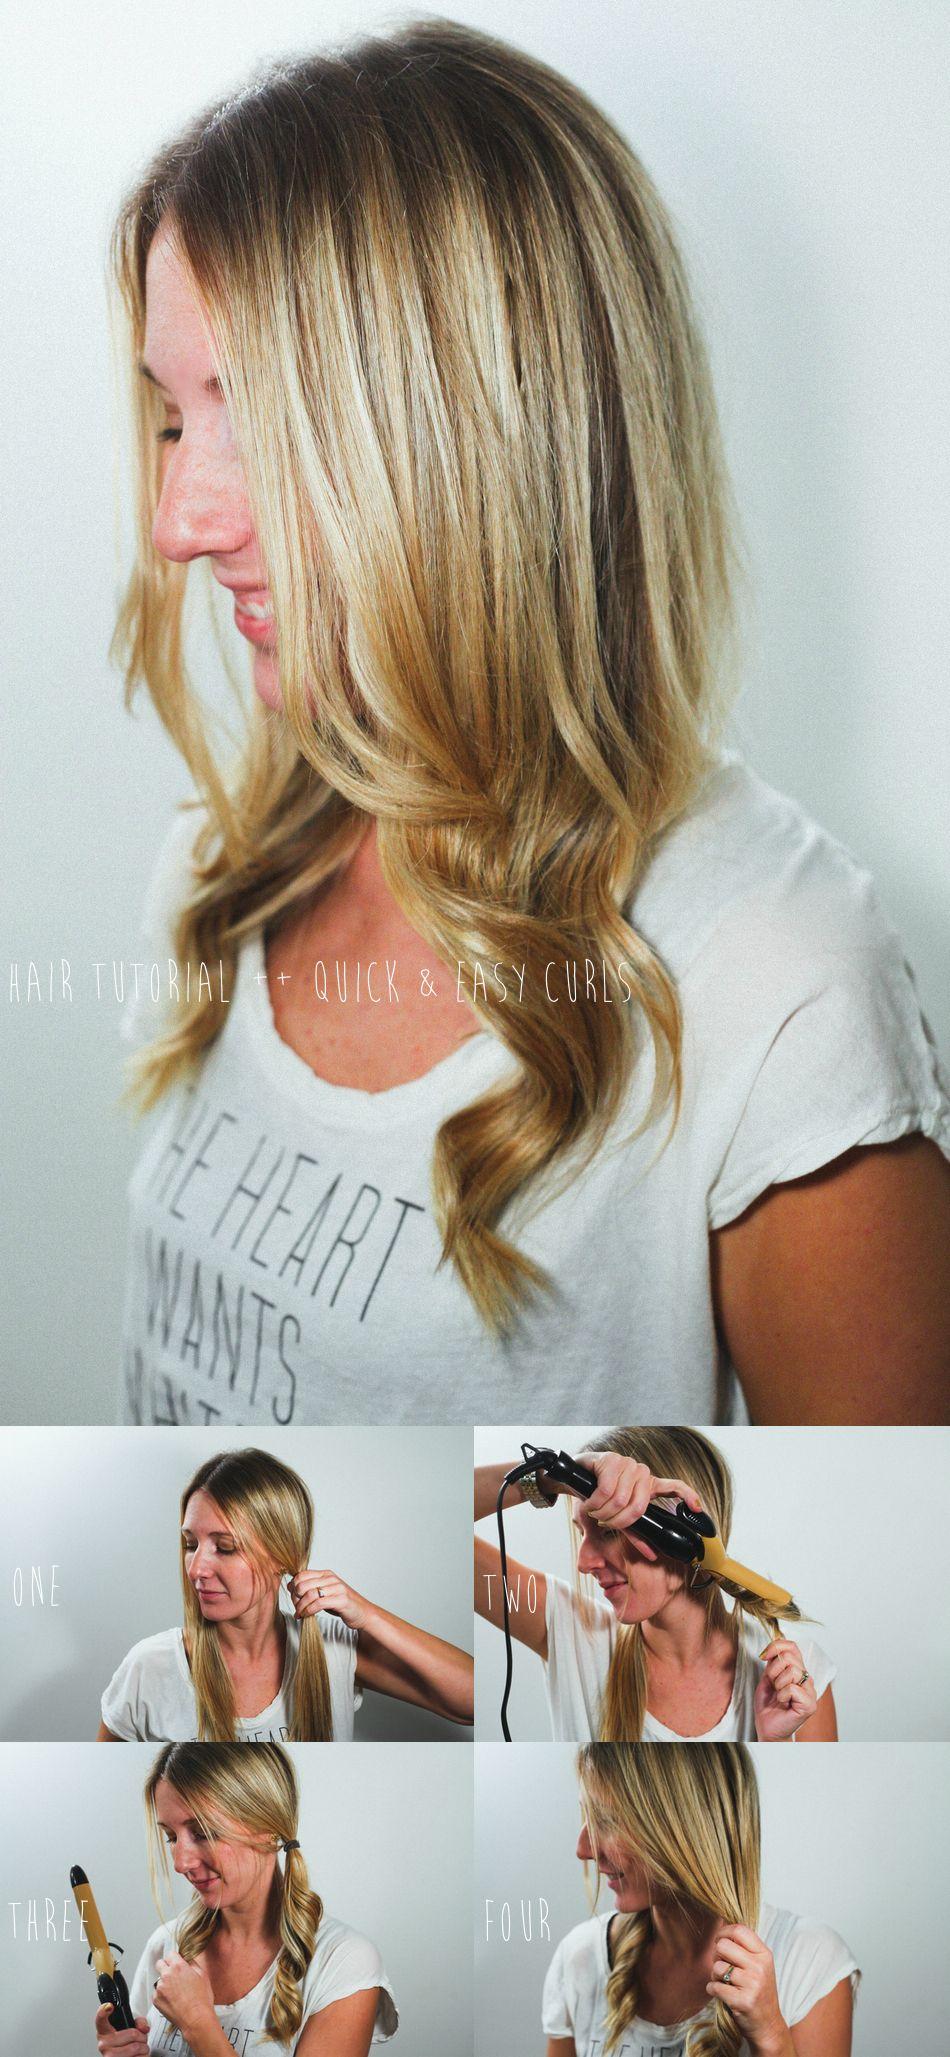 Hair tutorial quick u easy curls hair pinterest quick easy